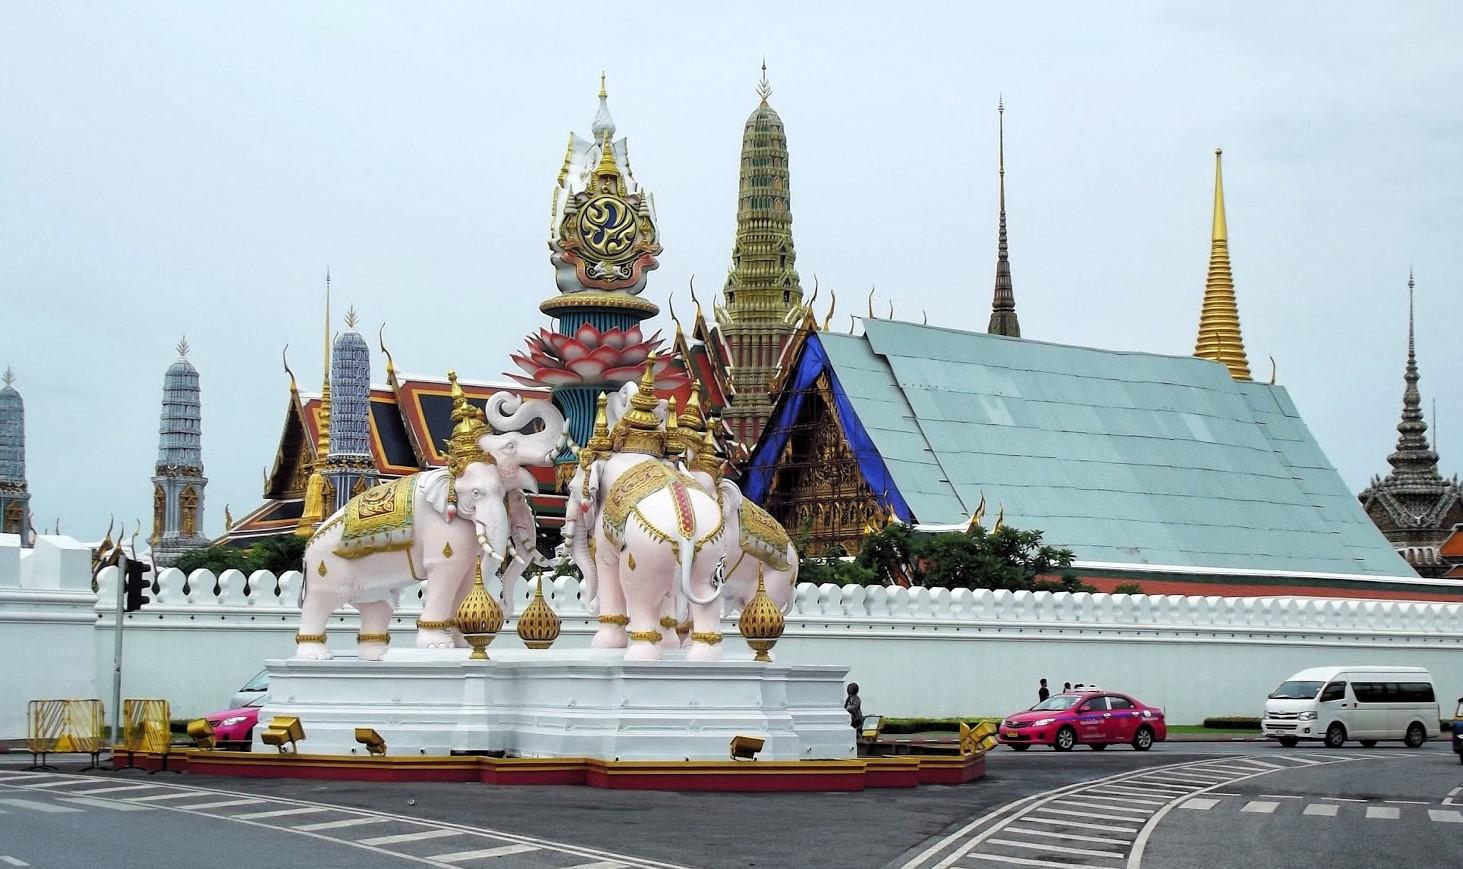 69. Bangkok, Thailand